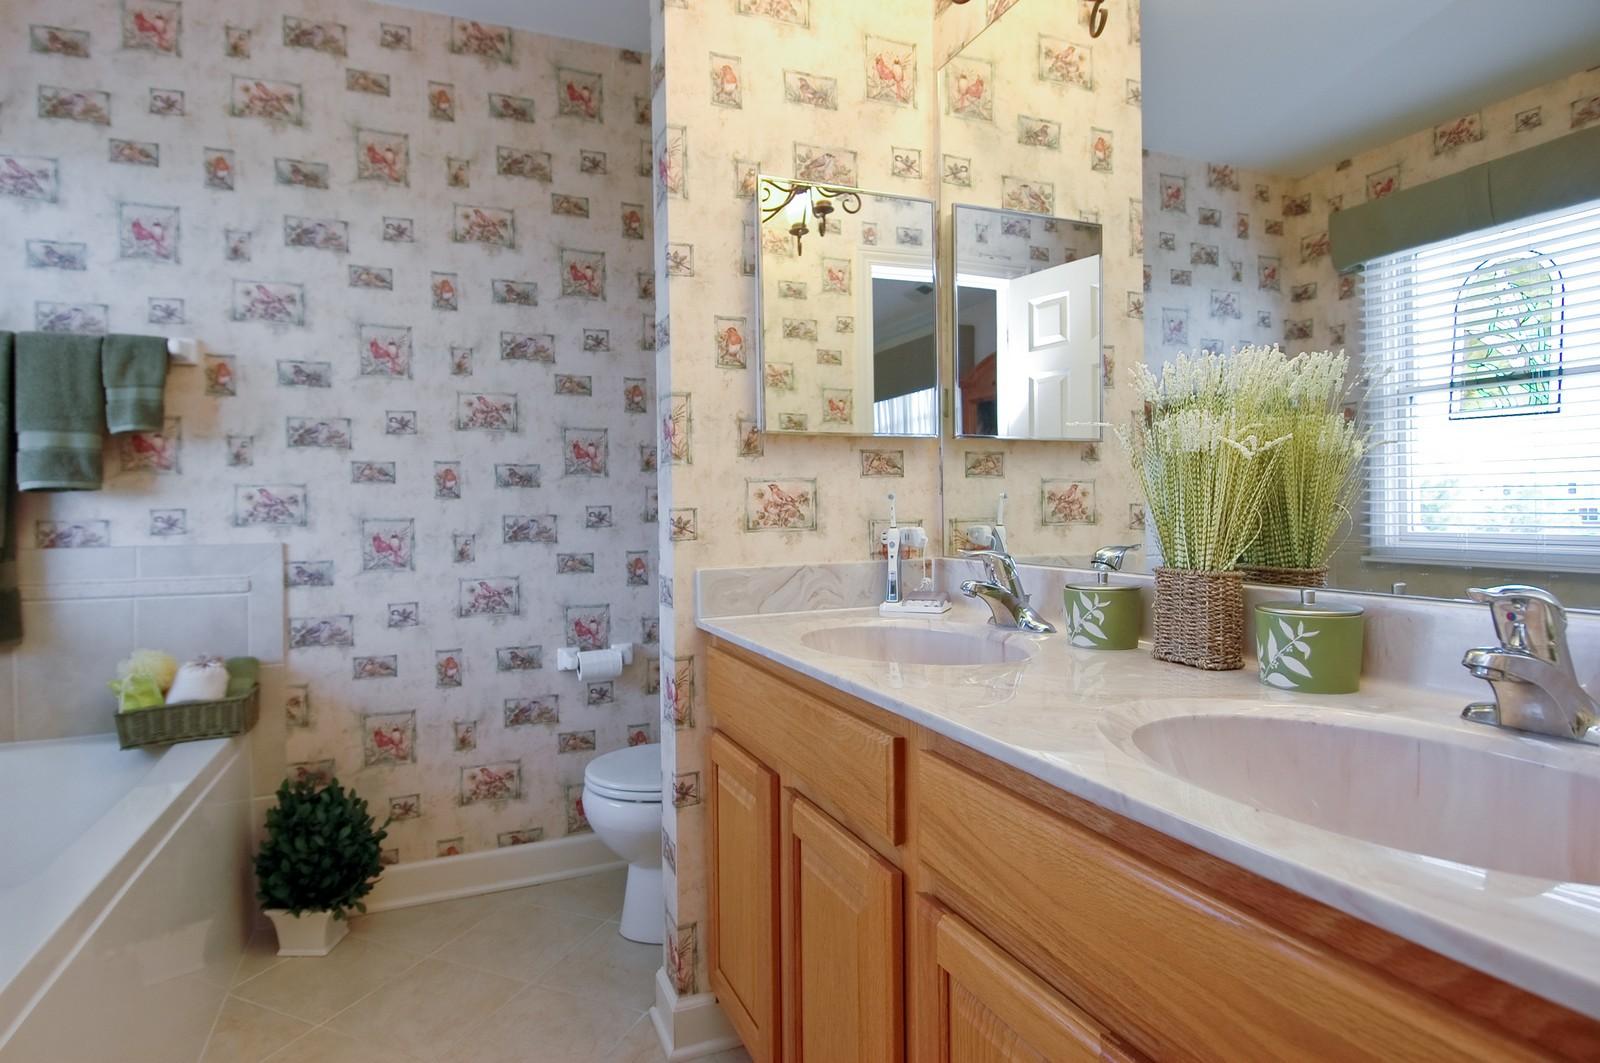 Real Estate Photography - 8337 Raptor, Lakewood, IL, 60014 - Master Bathroom